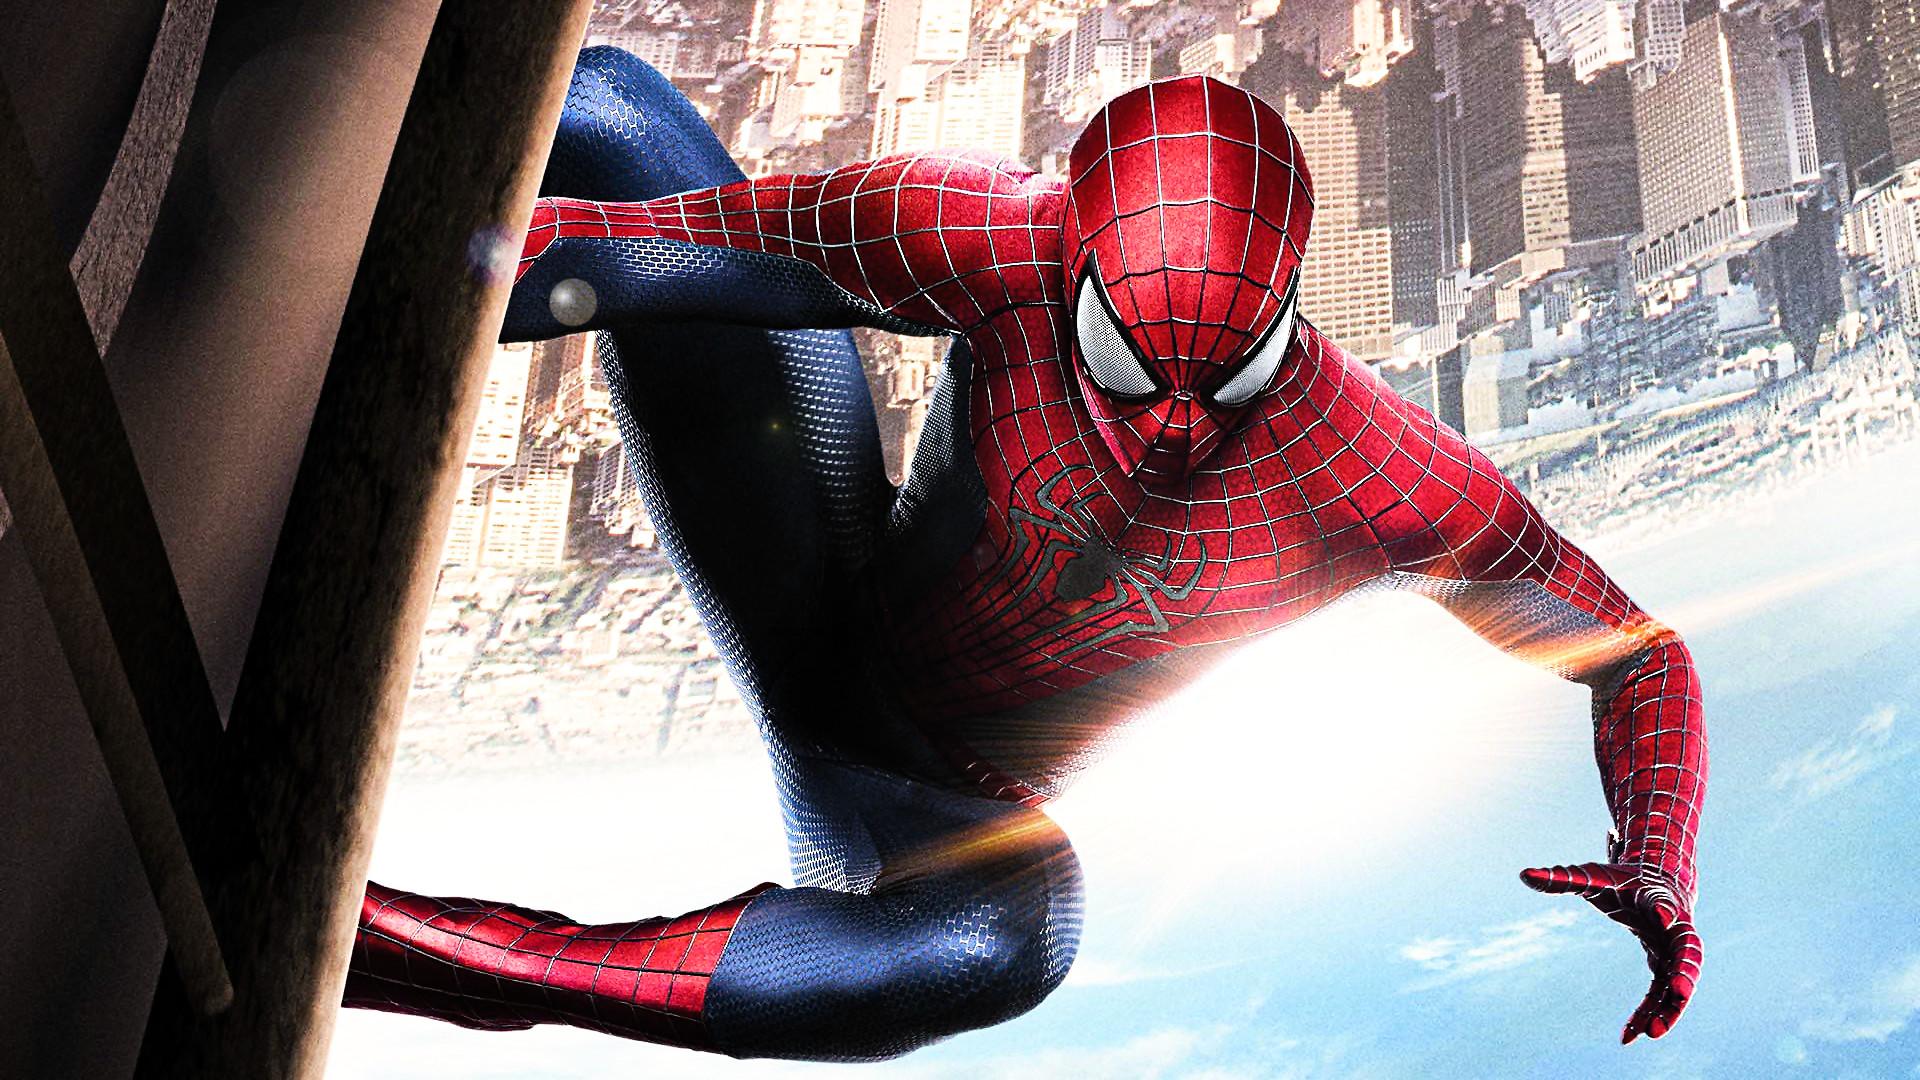 Spiderman 4 Wallpaper (65+ images)